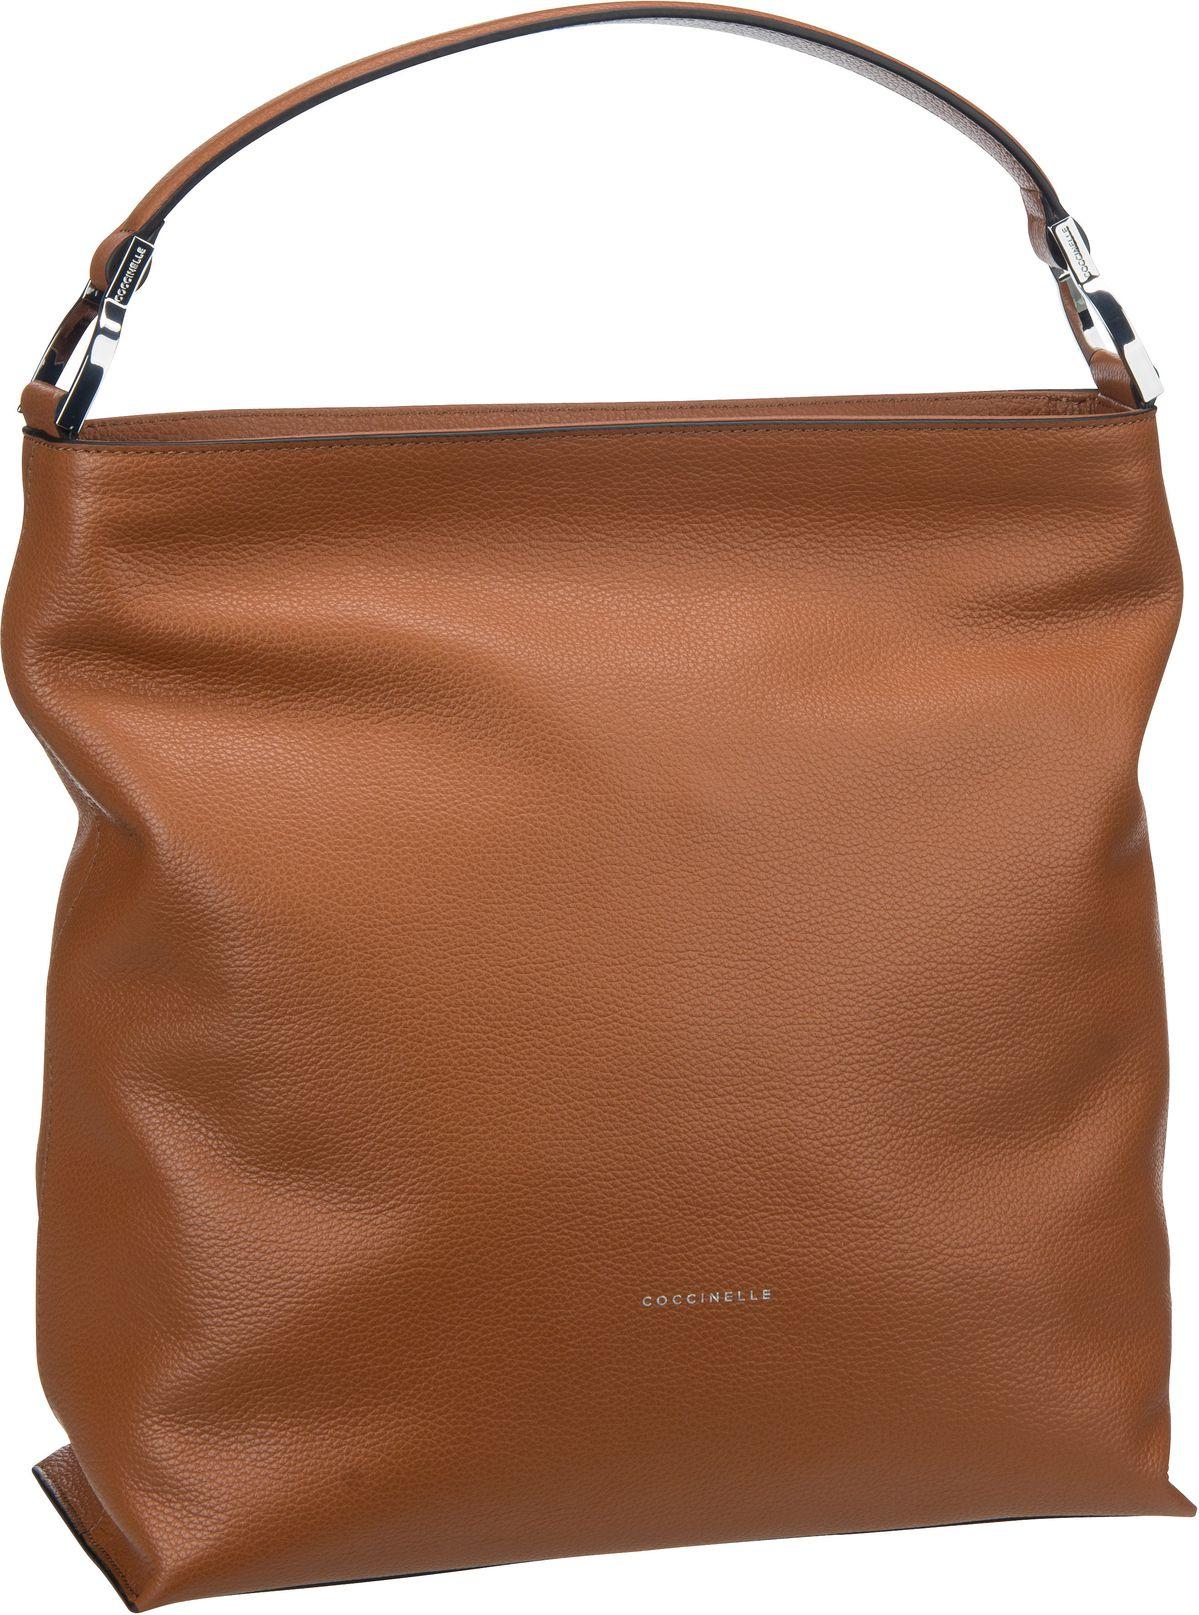 Handtasche Keyla 1302 Tan